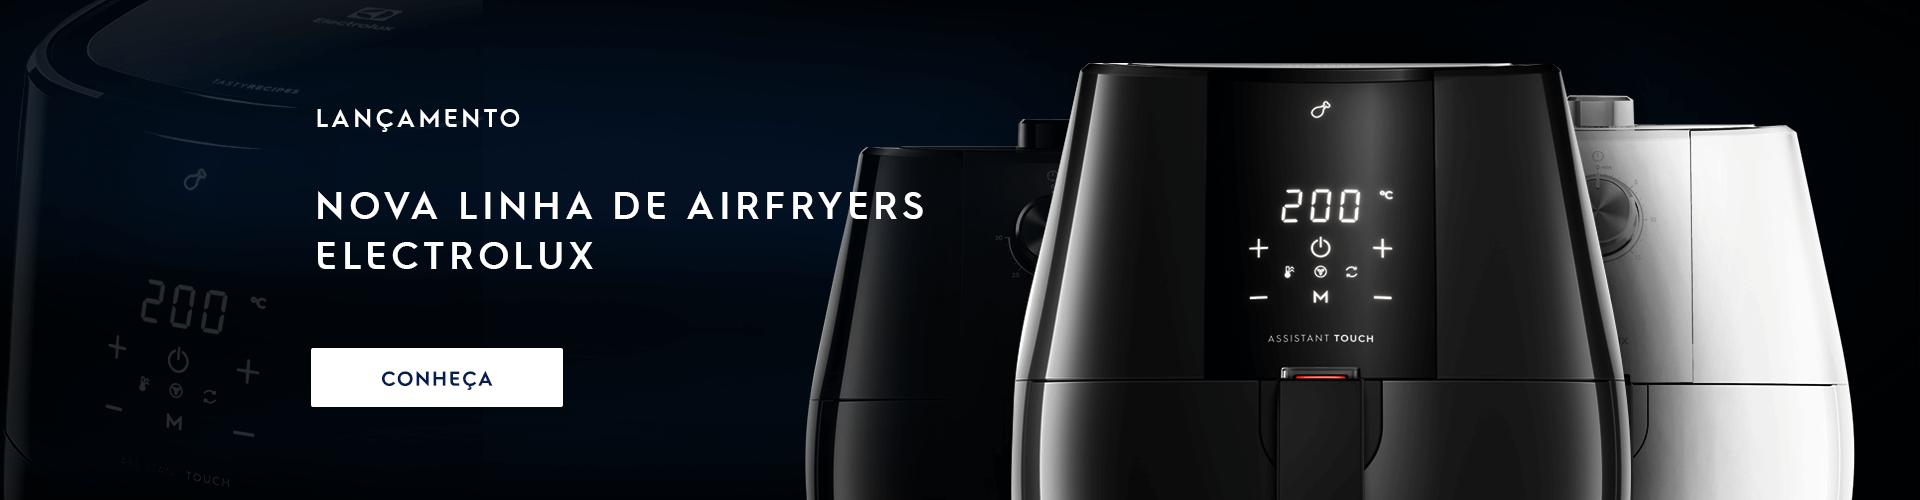 Lançamento Air Fryer